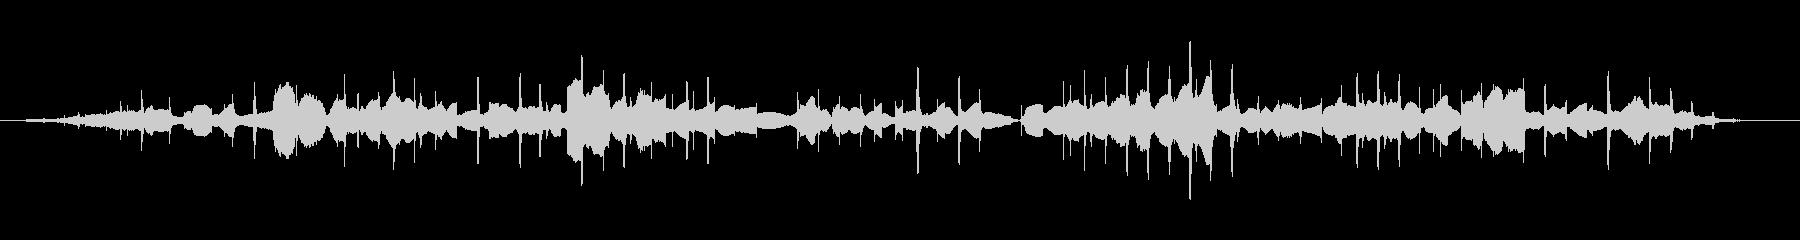 116 (UP-13)の未再生の波形